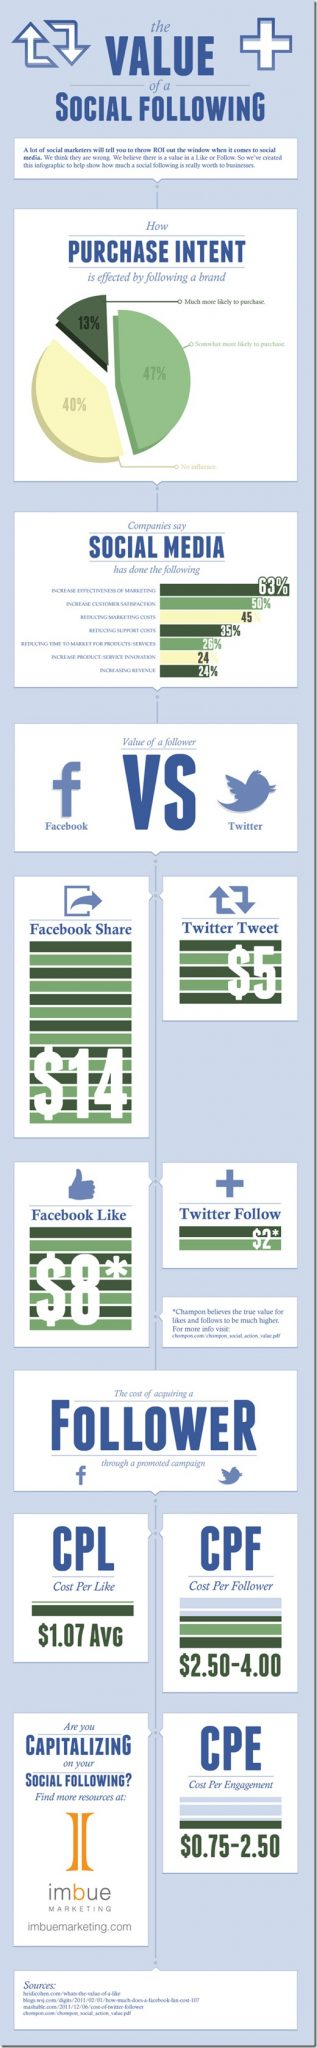 337984-social-media-value-infographic